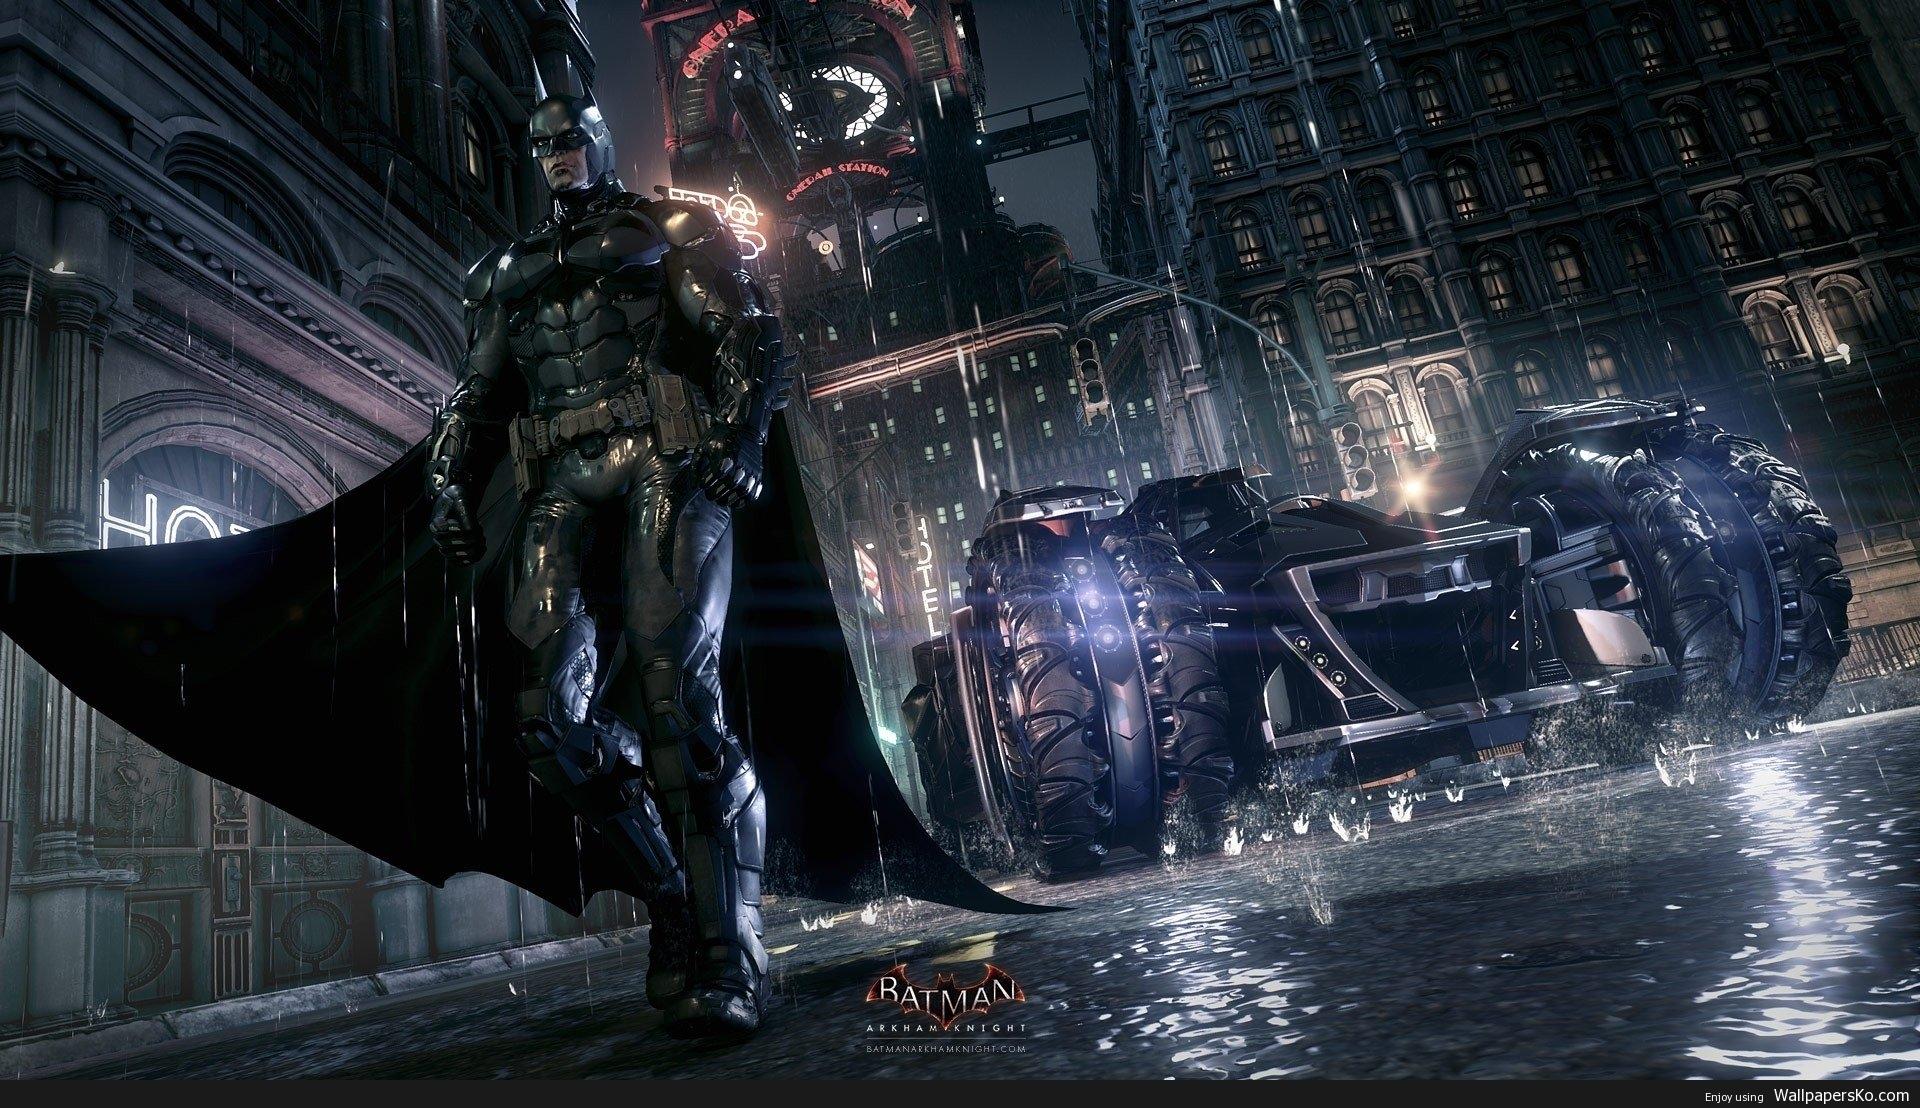 batman arkham knight wallpaper | hd wallpapers download